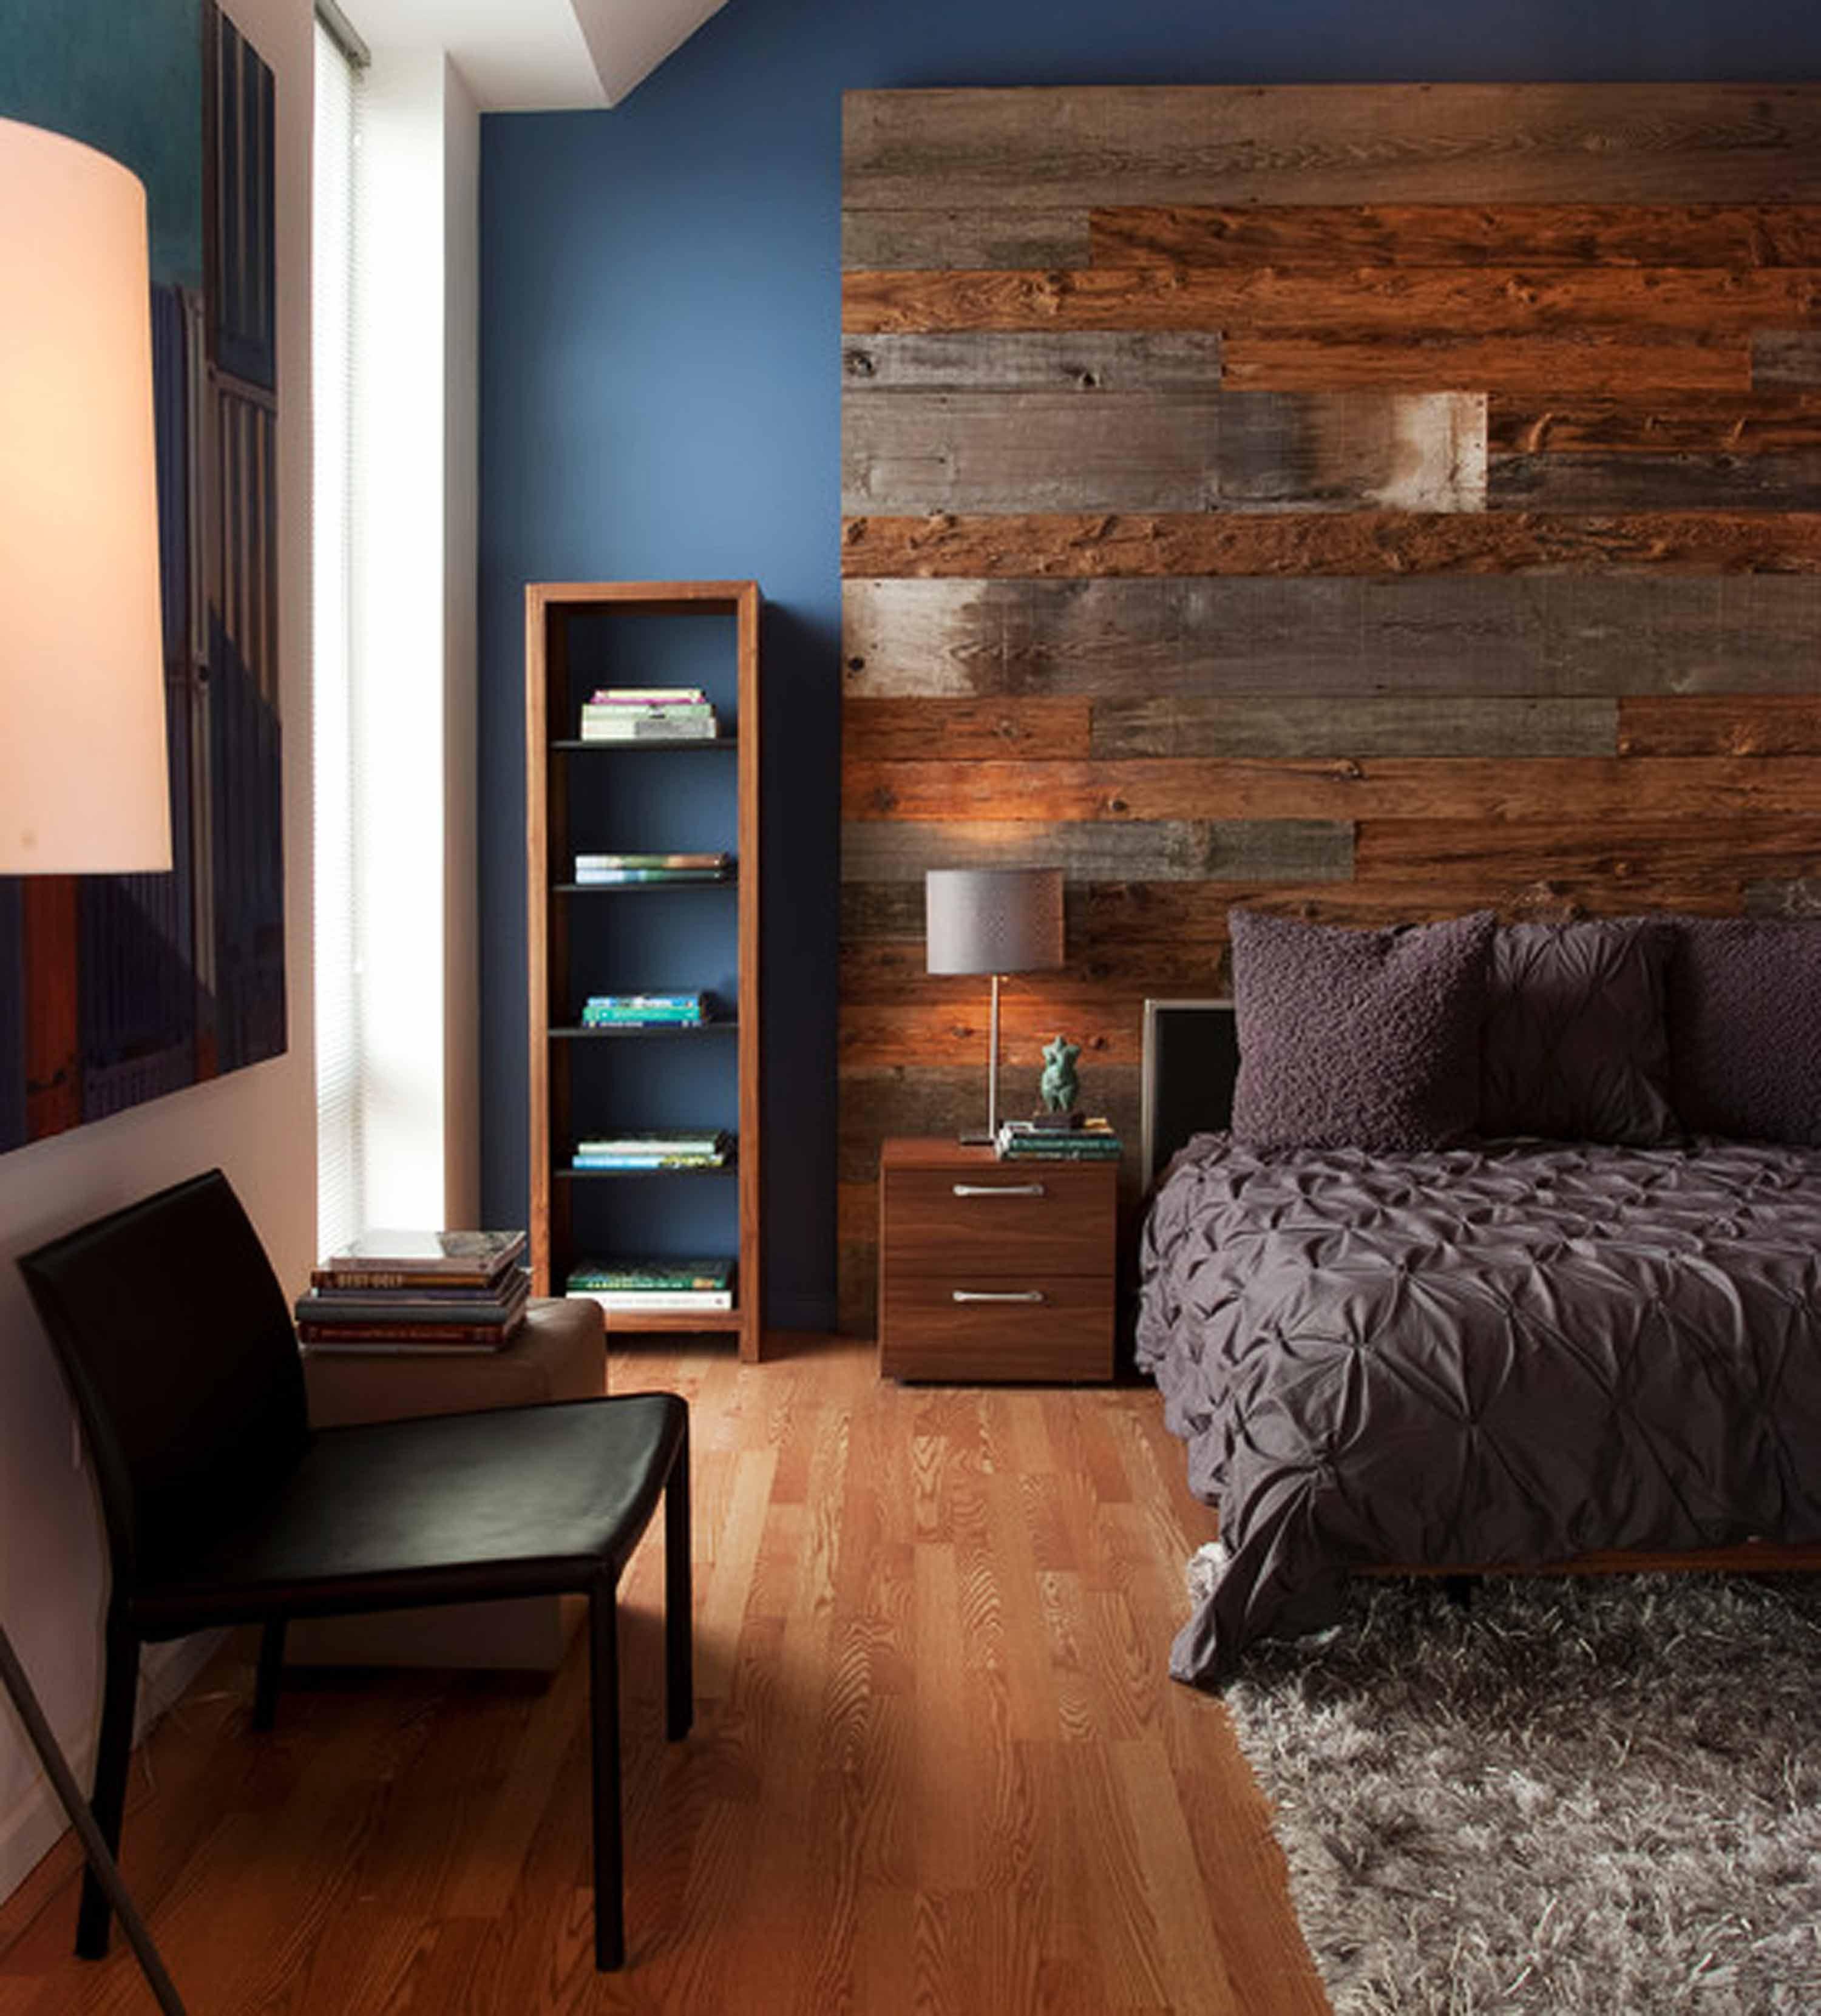 Brown and blue rustic bedroom - Contemporary Bedroom Blue Wall Paint Rustic Wood Headboard Brown Bedlinen Pillows Desklamp Nightstand Chair Bench Book Rack Cherry Wooden Laminate Flooring